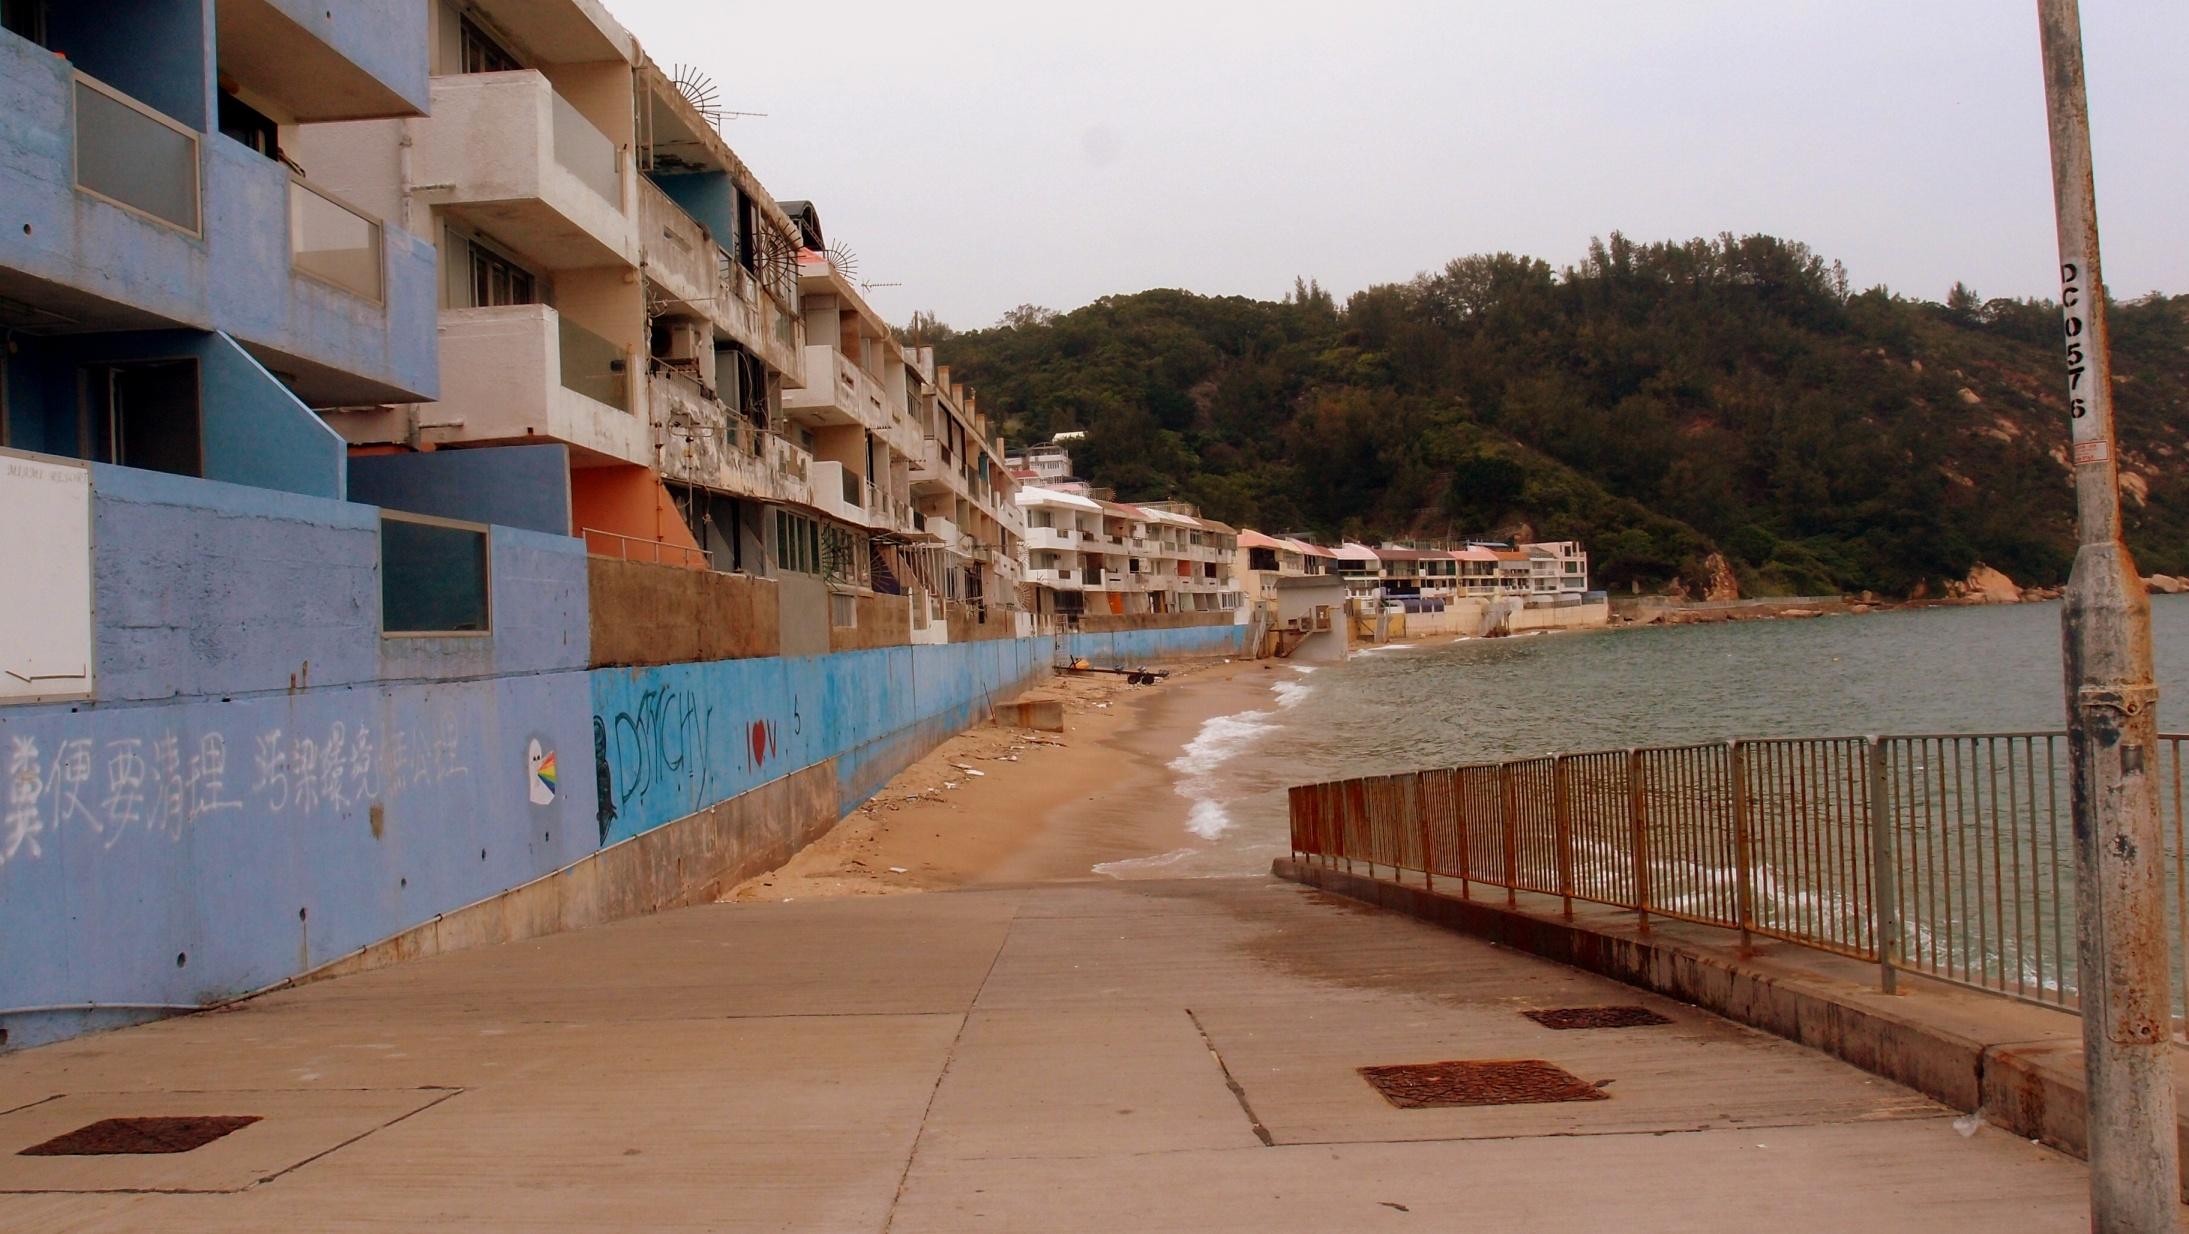 Beach apartments - the Miami Resort